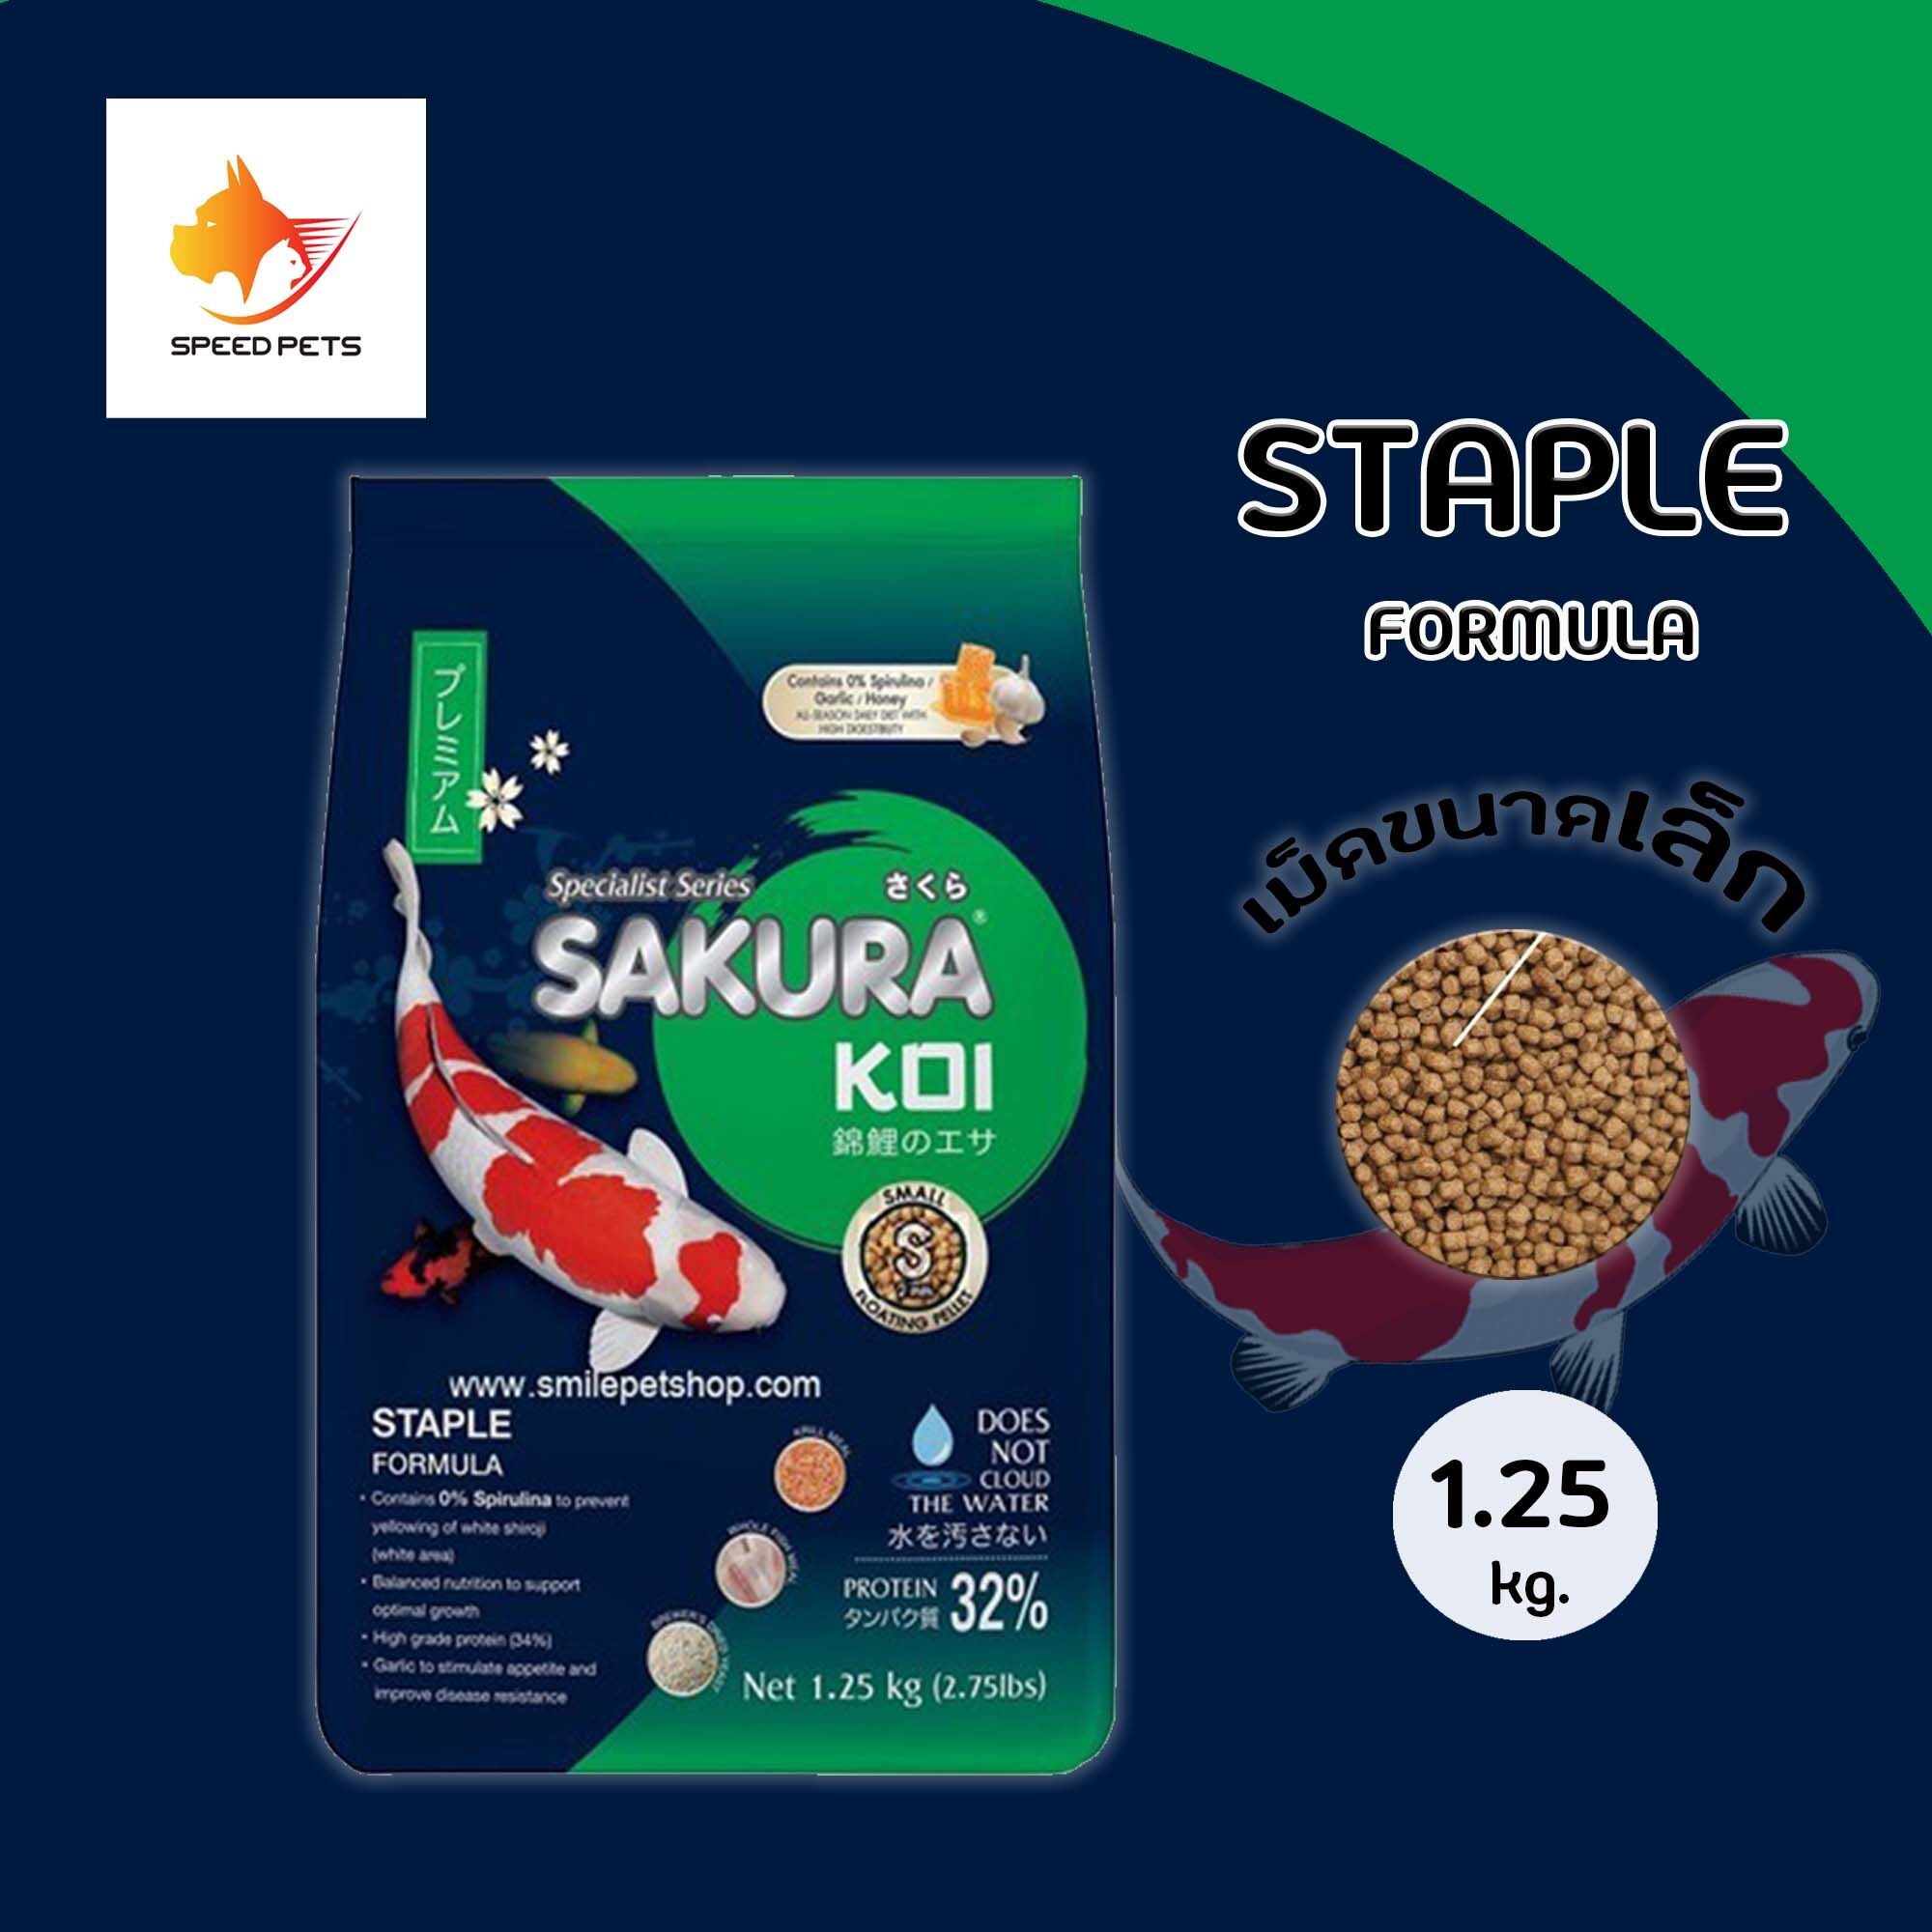 Sakura Koi Staple Fomula อาหารปลาเม็ดขนาดเล็ก  ขนาด 1.25 kg 1 ถุง